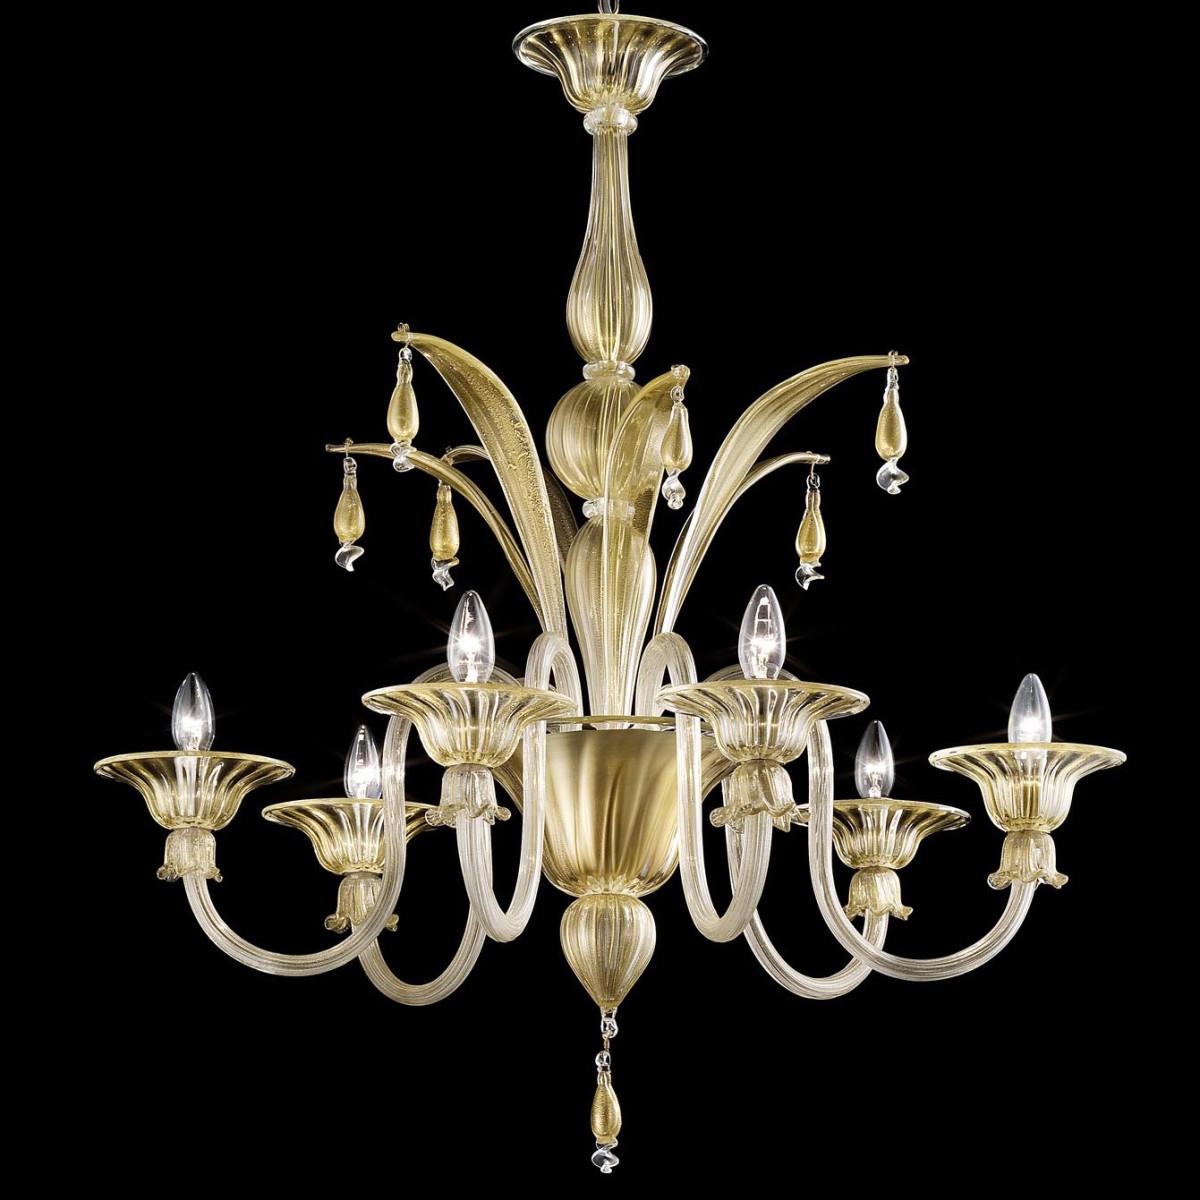 """Incanto"" araña de Murano 6 luces - oro y transparente"